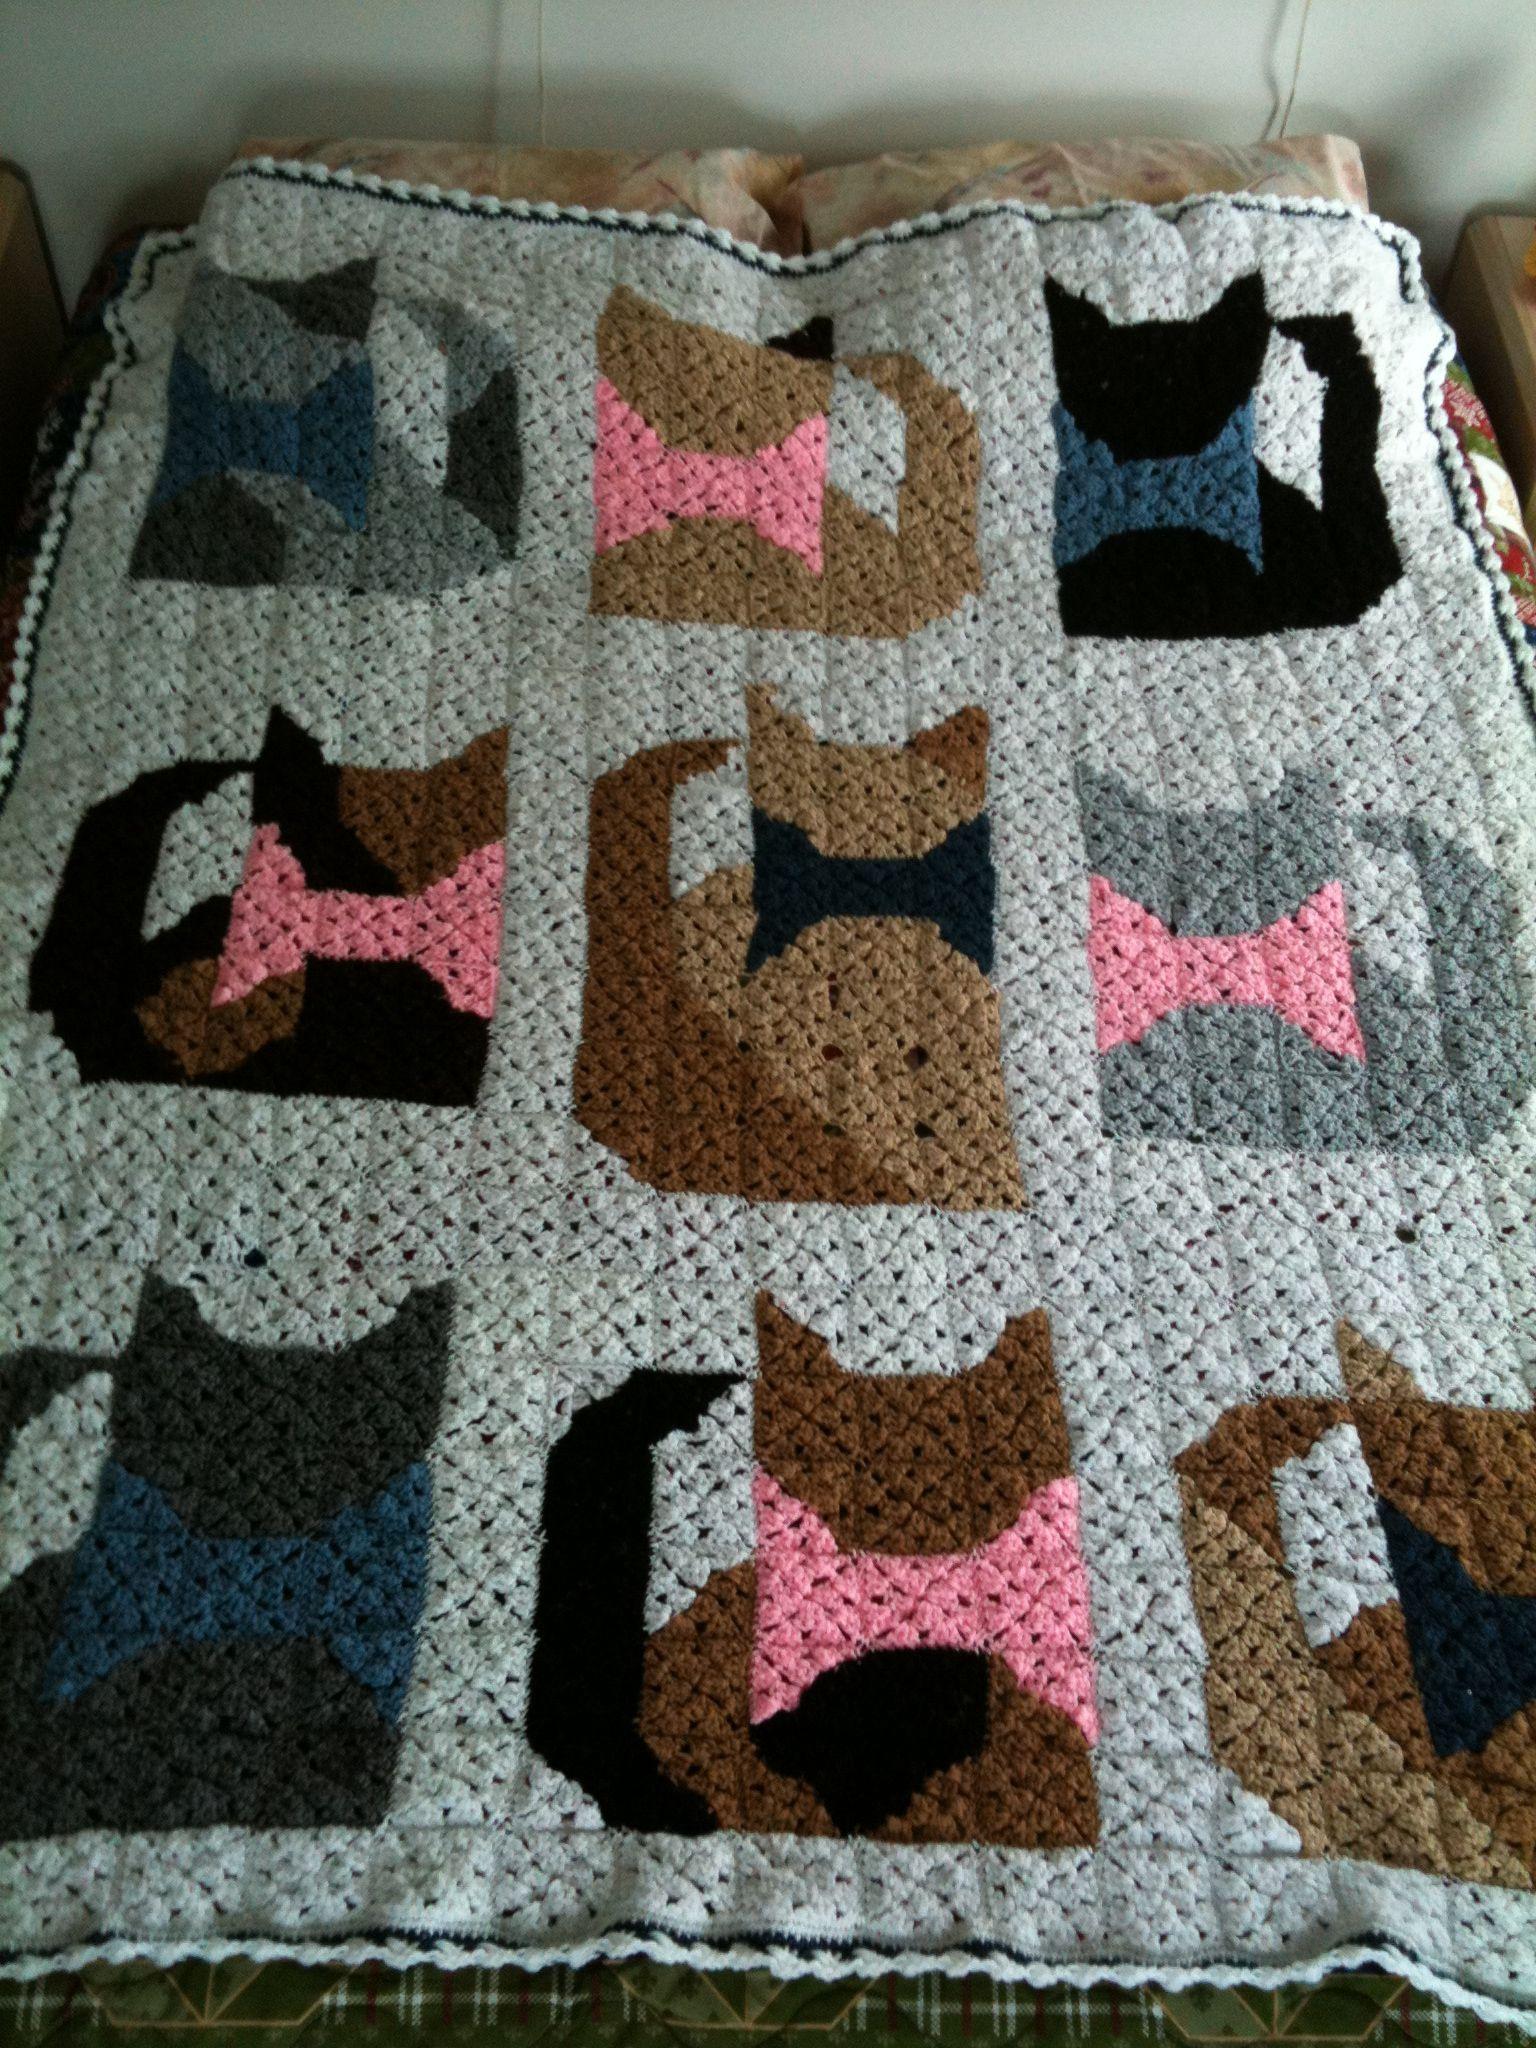 Cats Afghan - Free Pattern | Afghan crochet patterns, Crochet ... | 2048x1536